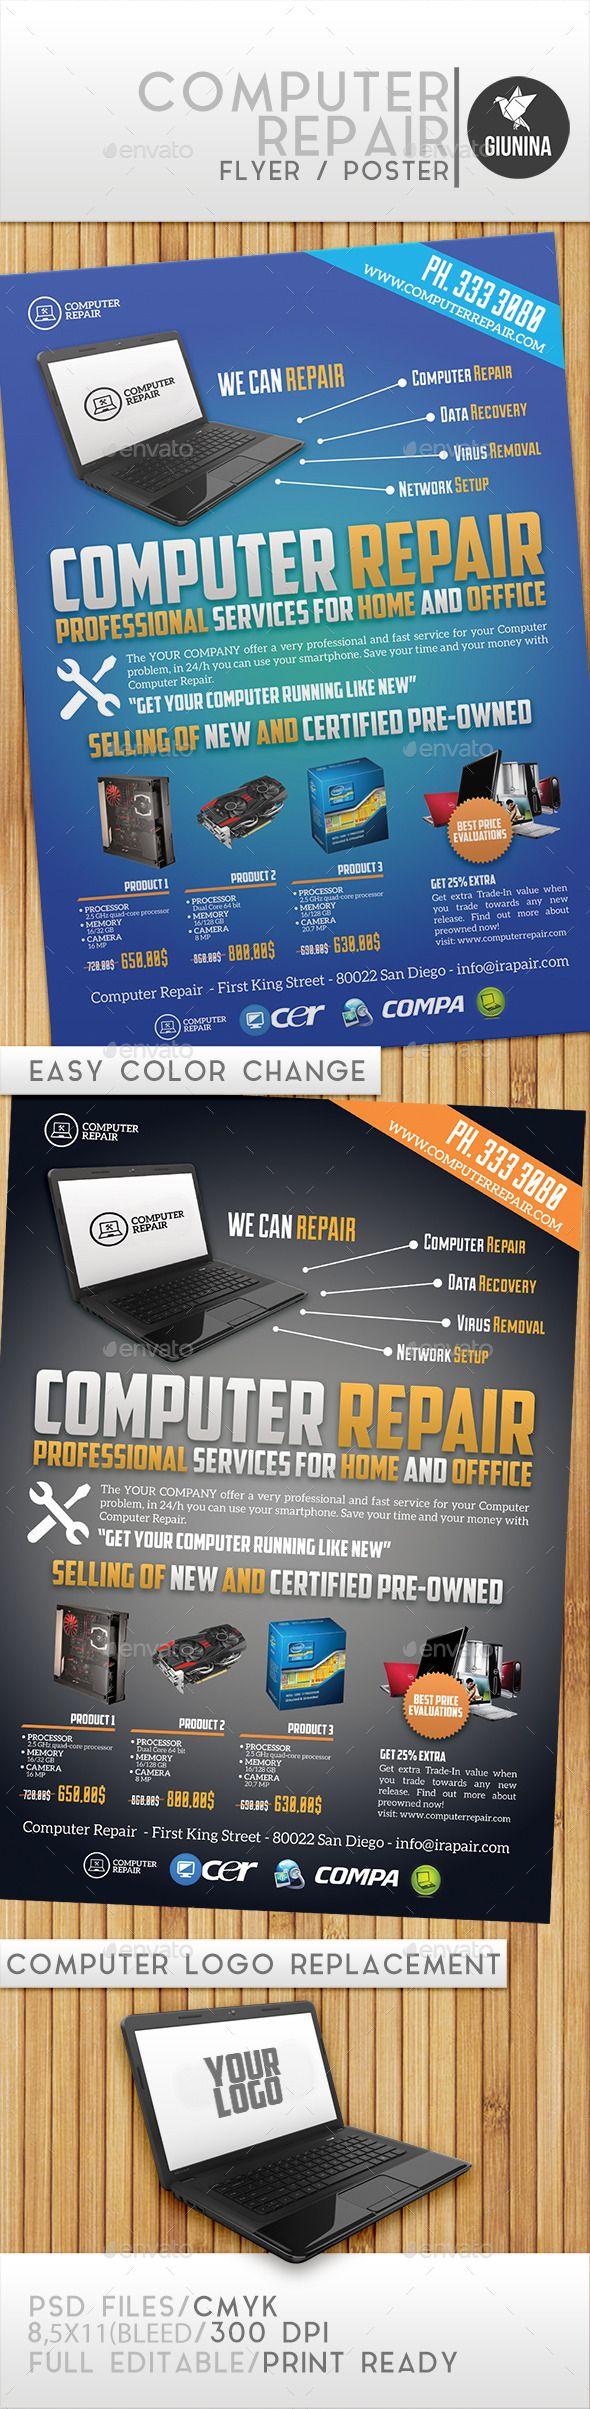 Computer Repair Flyer Template #design Download: http://graphicriver.net/item/computer-repair/12465842?ref=ksioks